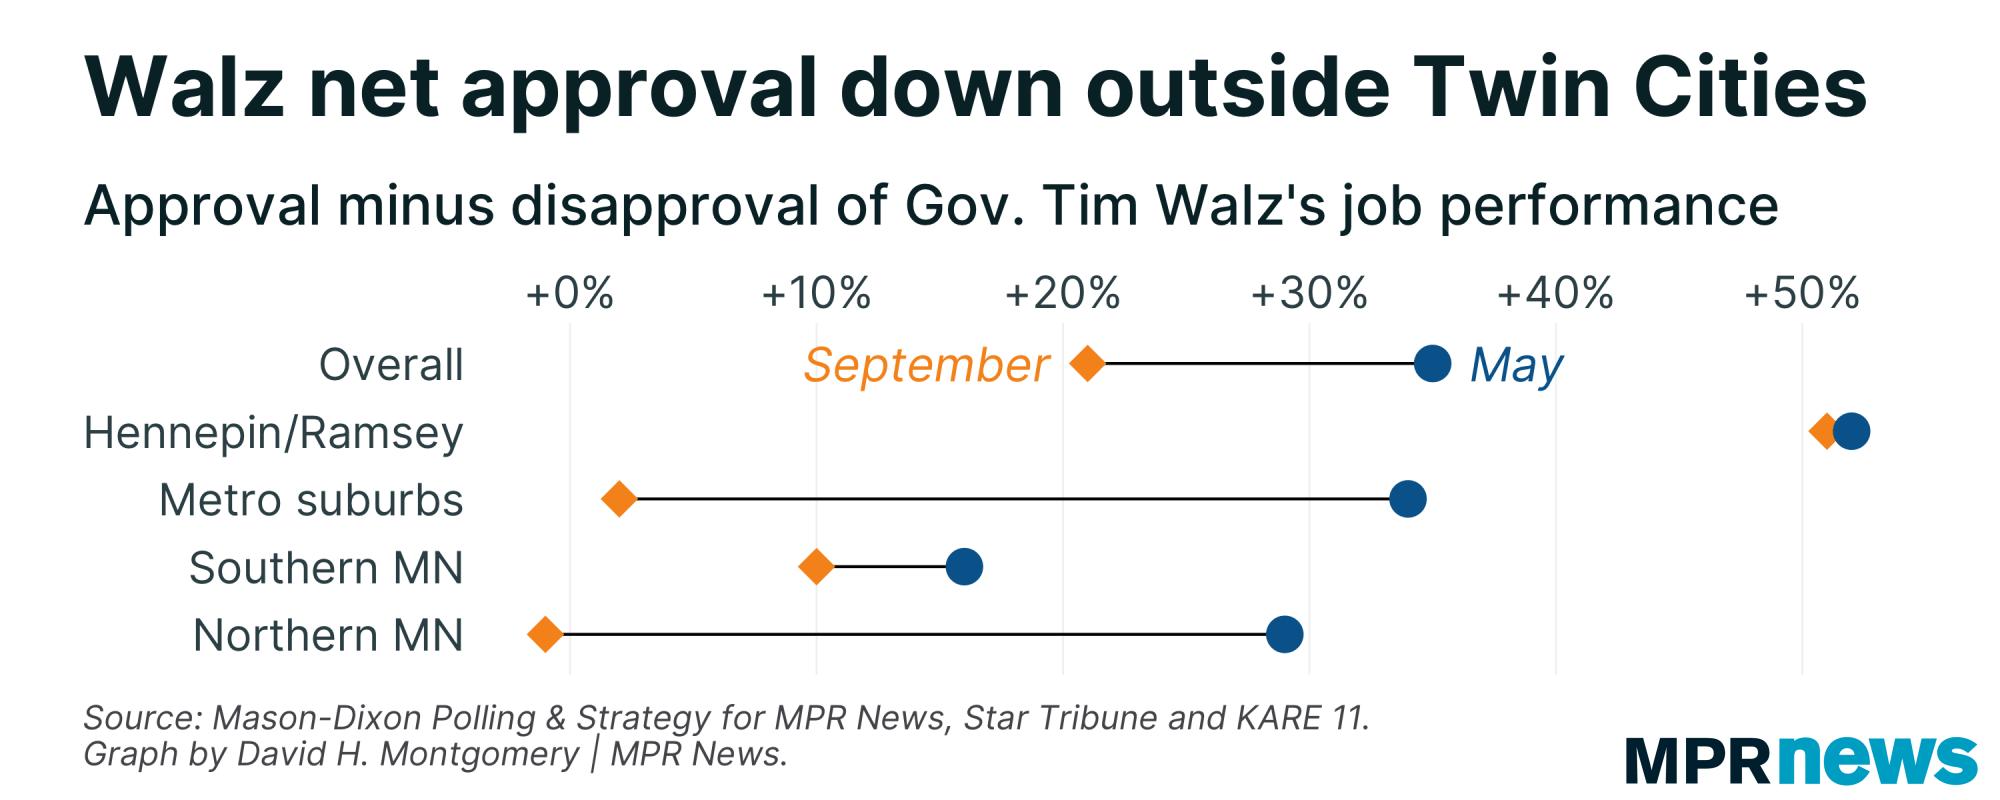 Gov. Tim Walz's net approval rating has fallen outside the Twin Cities